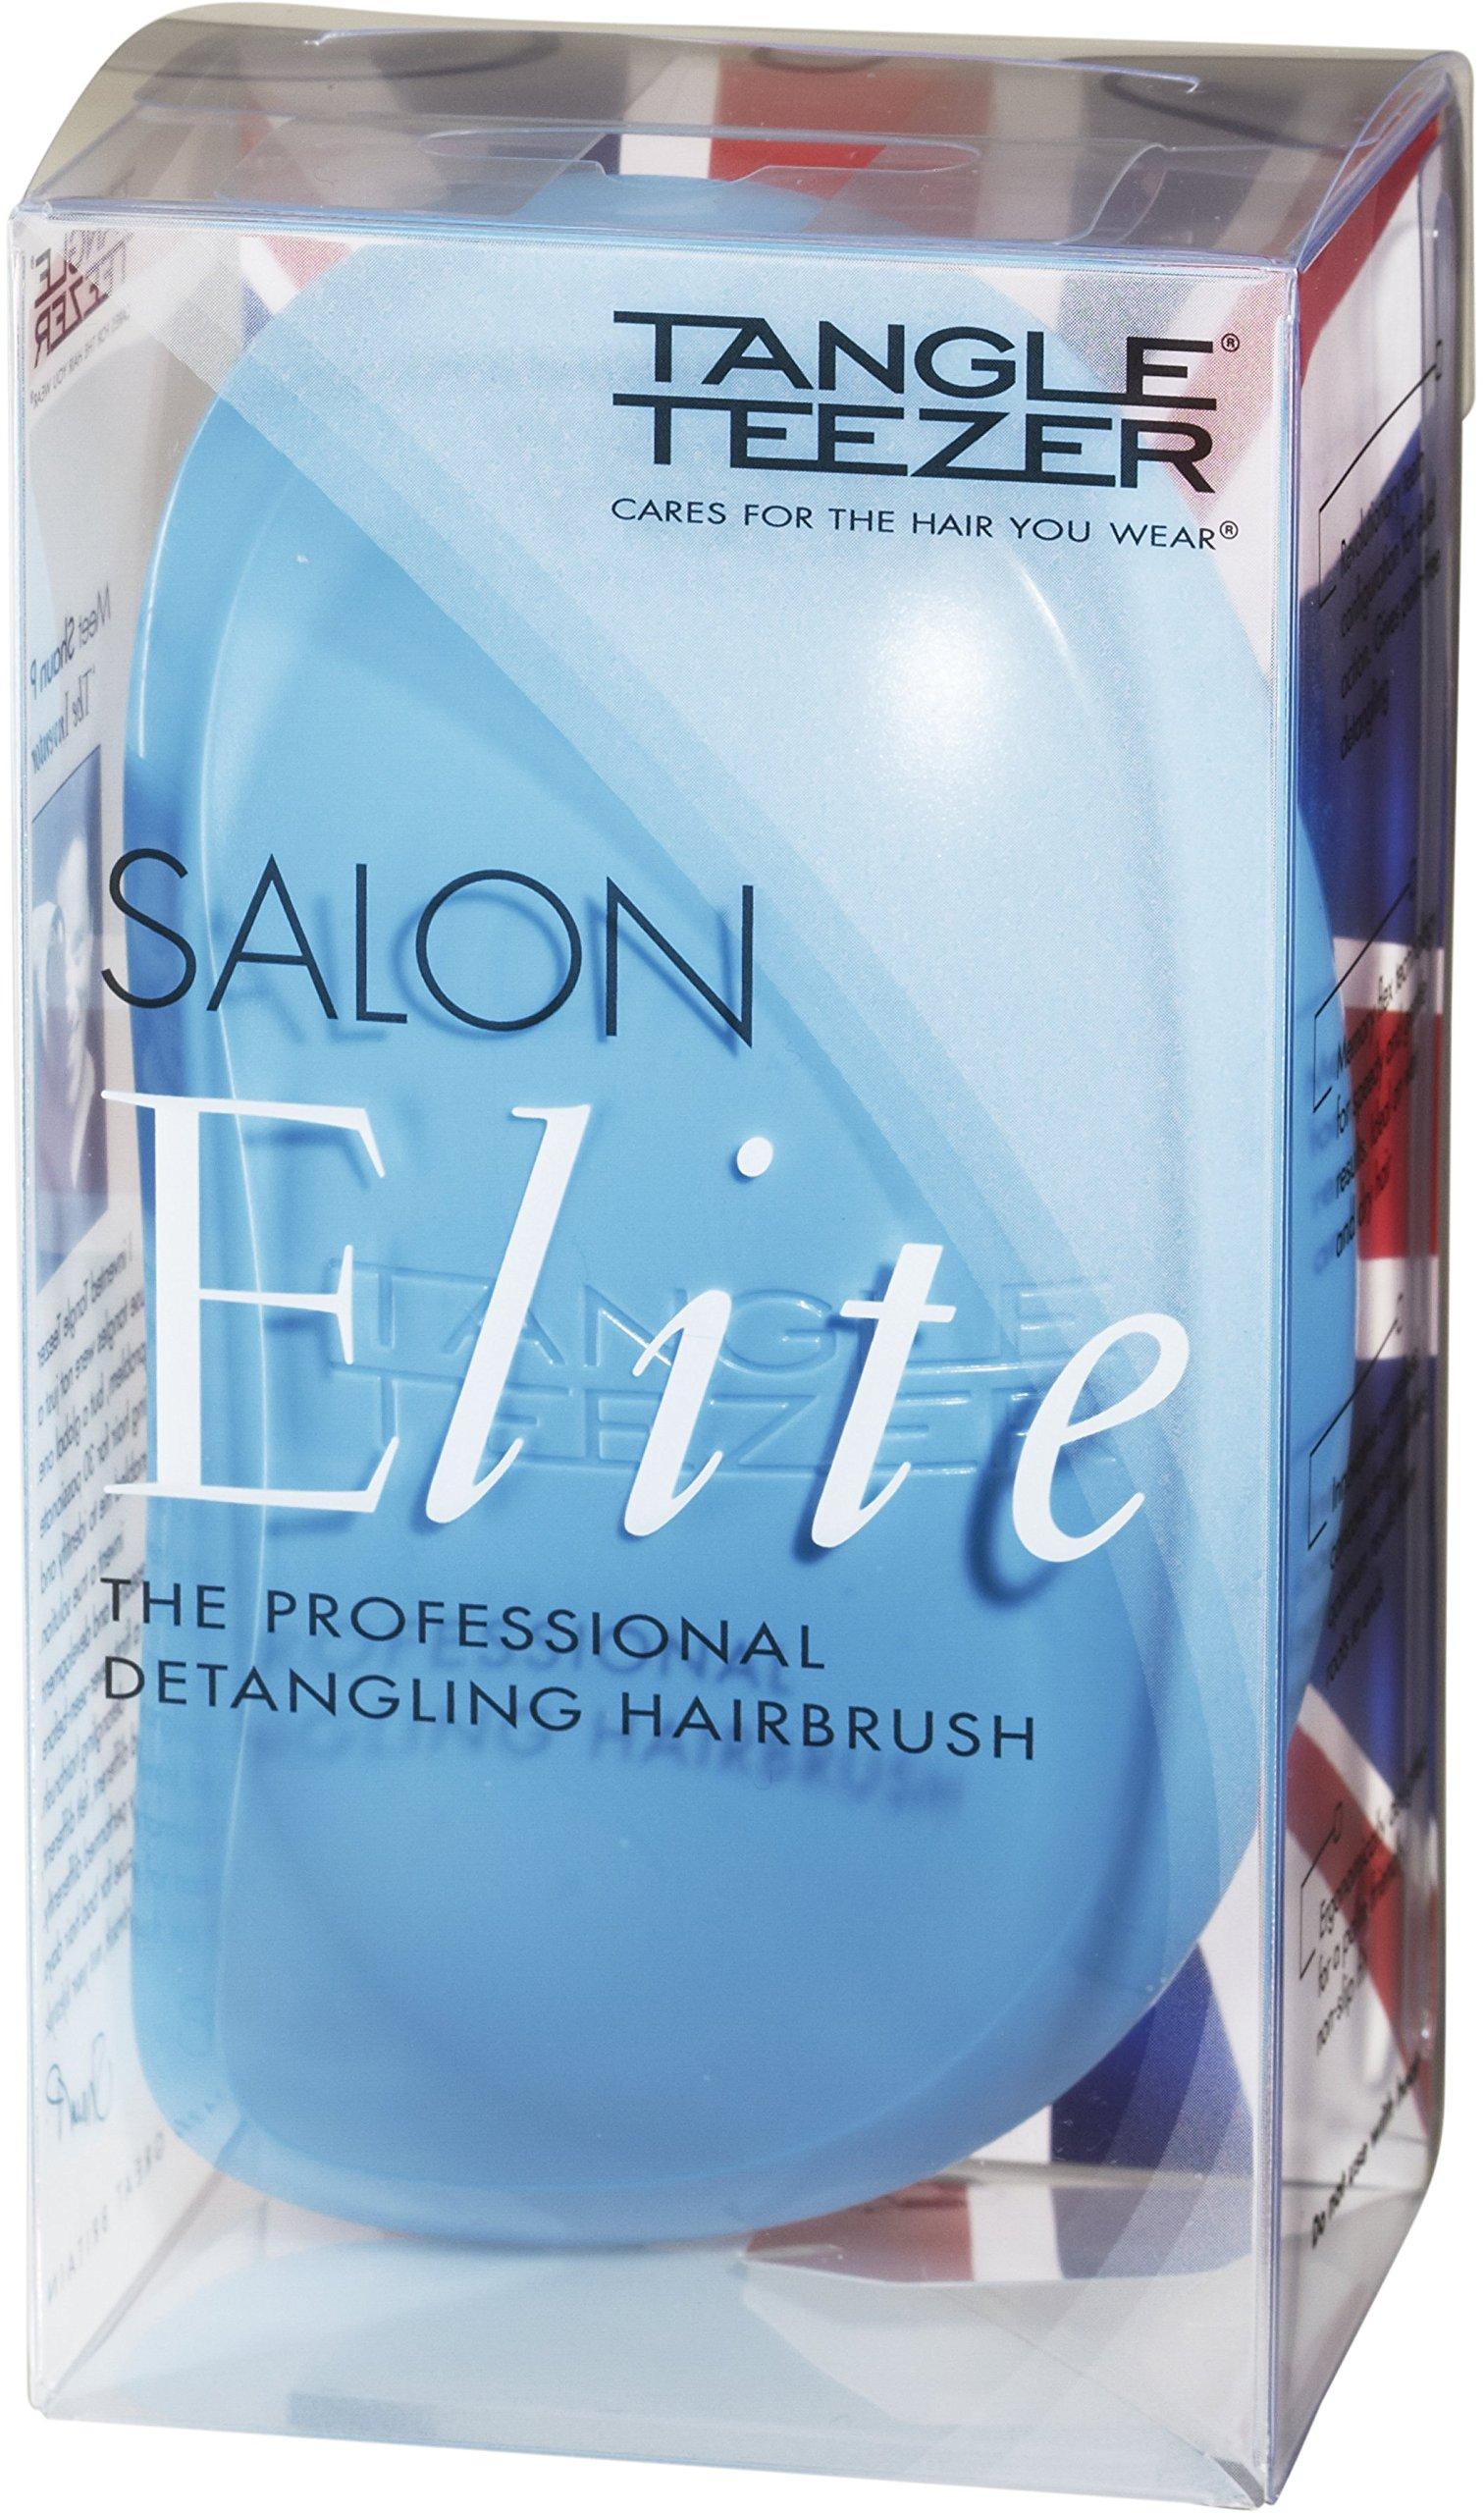 amazon com tangle teezer salon elite detangle hairbrush dolly